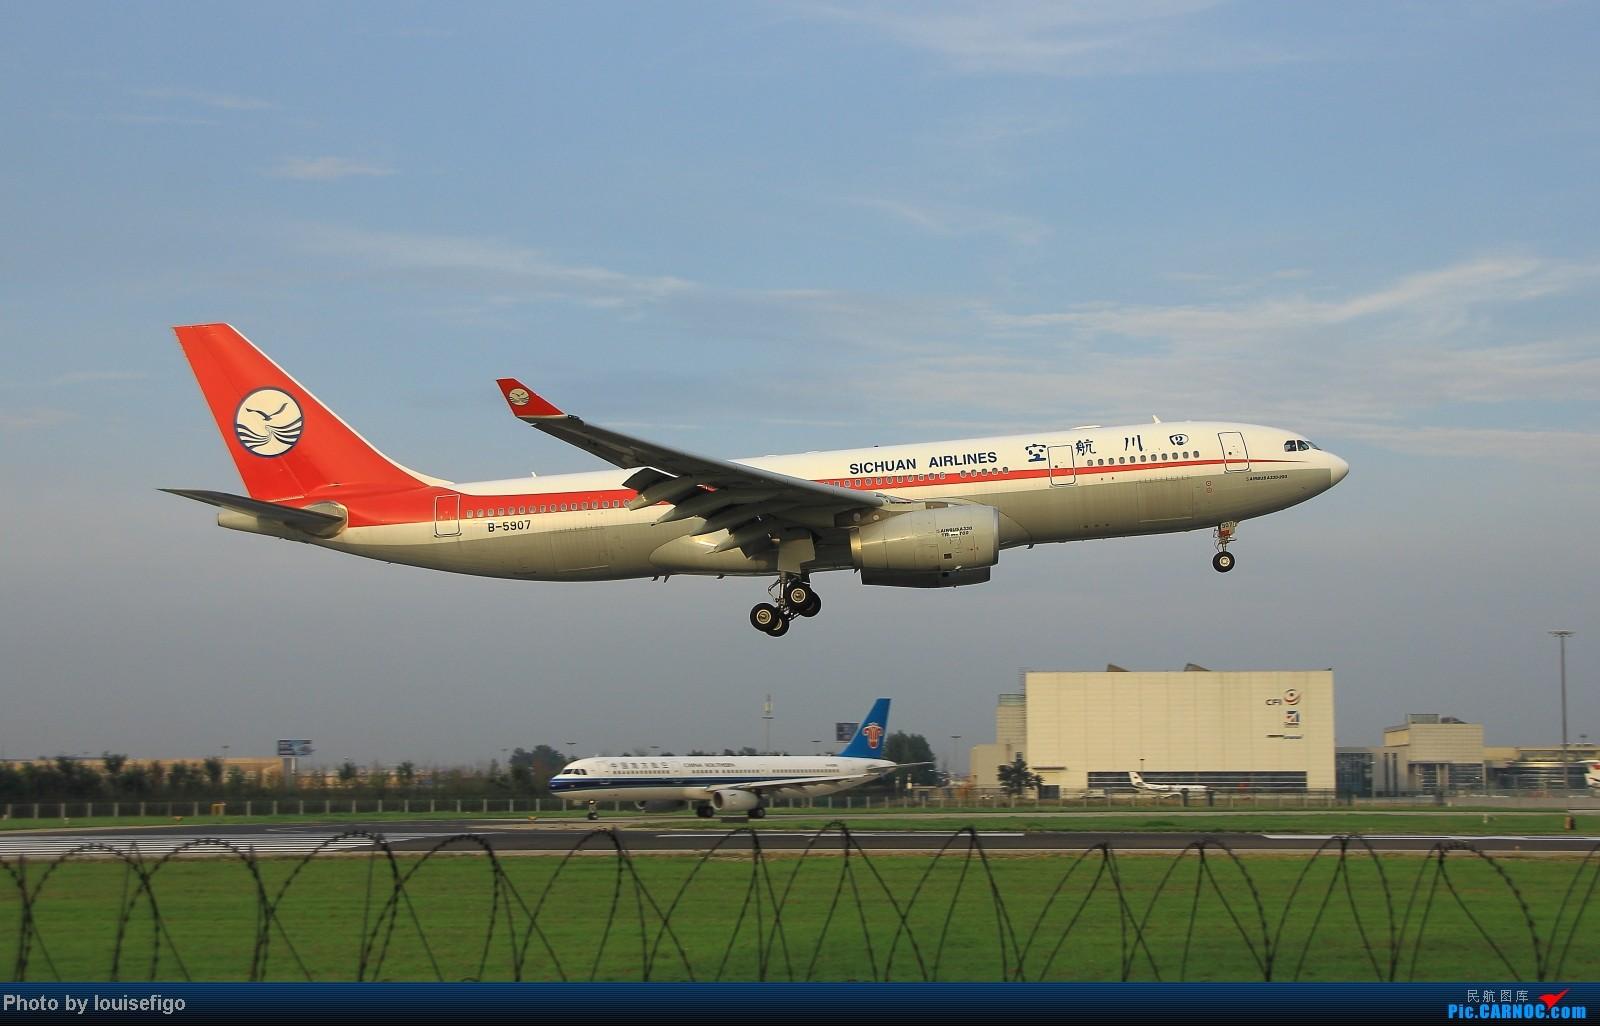 Re:[原创]闲来无事天气闷,发点冷饭自娱乐!!!PEK西跑的降落杂图~发到哪儿是哪儿啊!随心情! AIRBUS A330-200 B-5907 北京首都国际机场